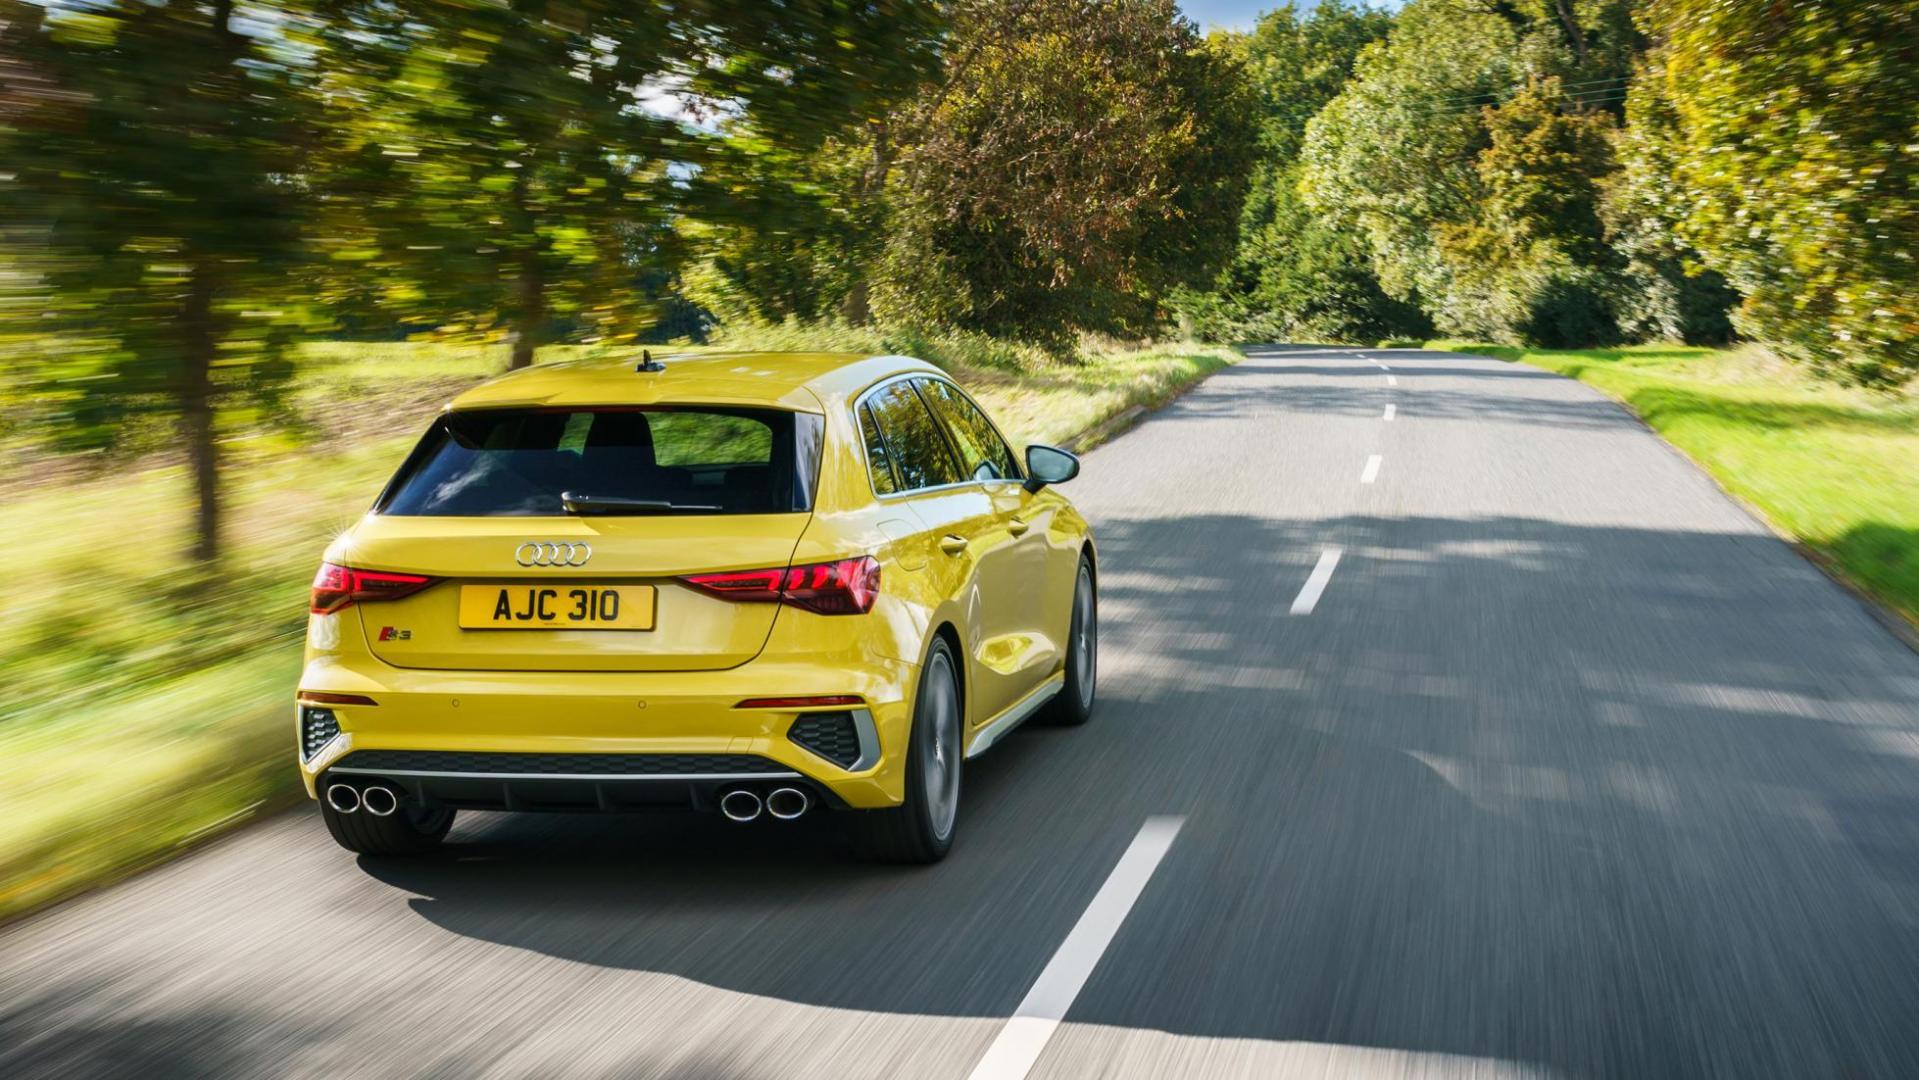 Audi S3 Sportback (2020) - Imola Gelb (Geel)